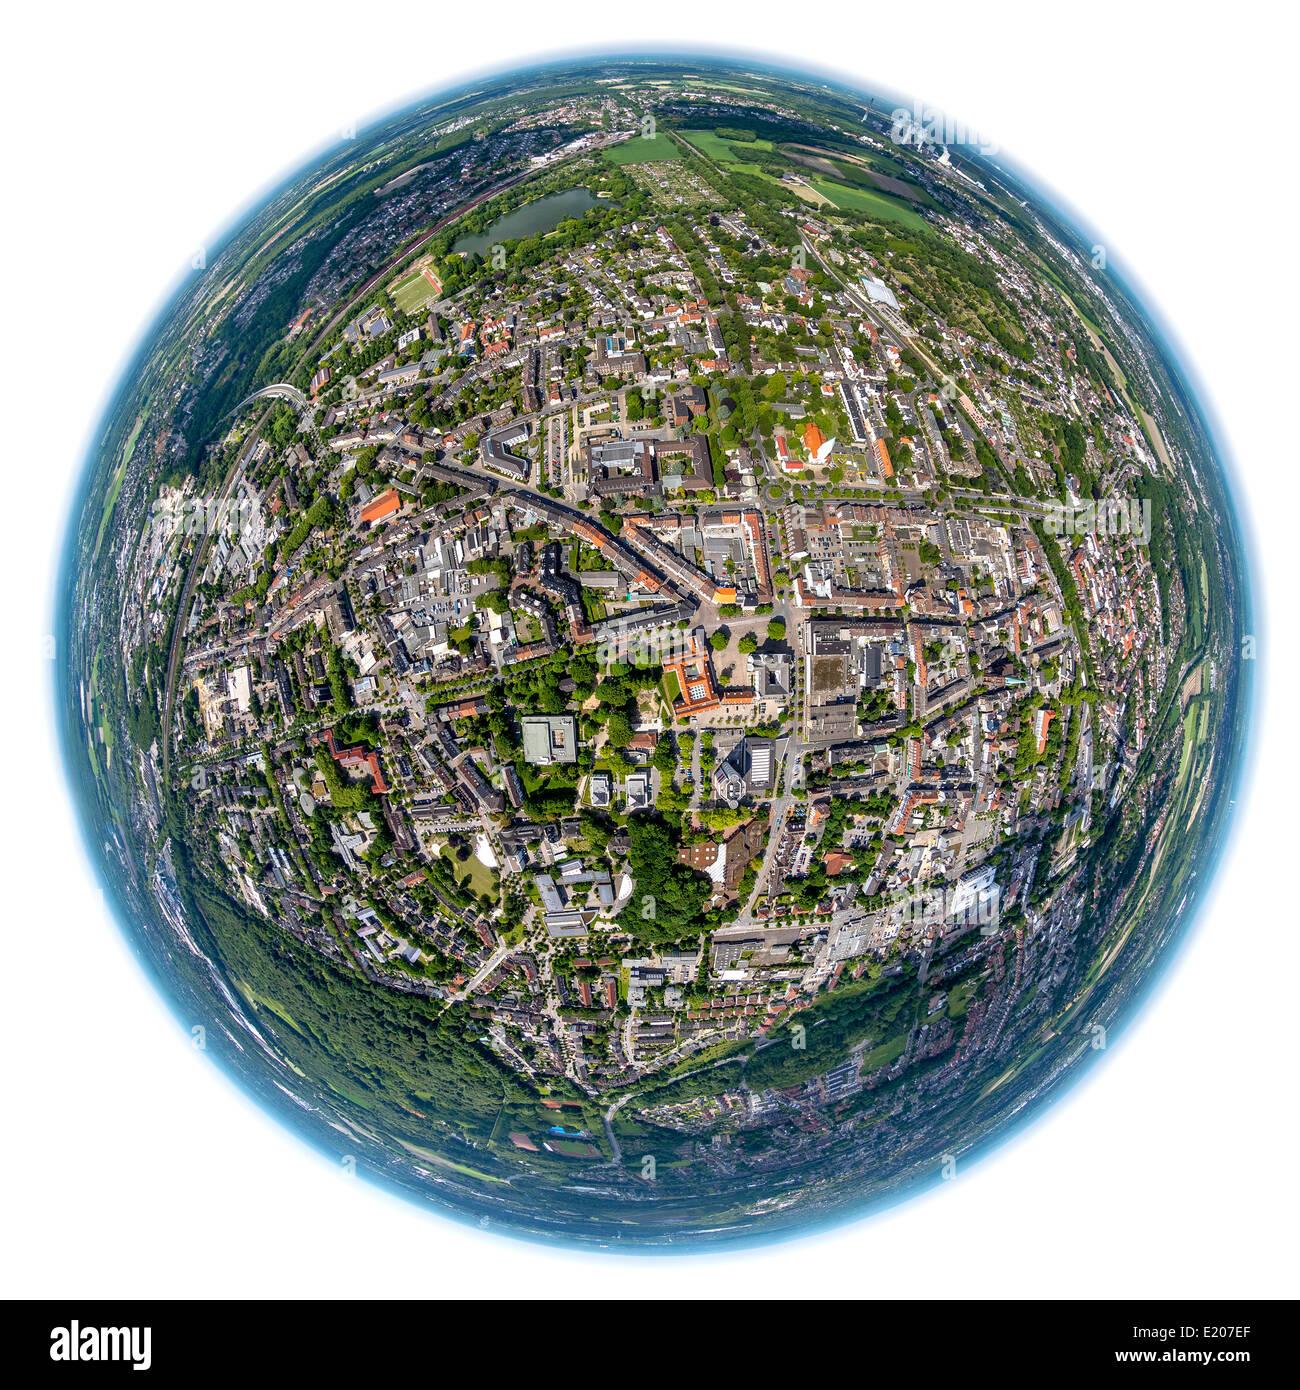 Aerial view, fisheye, Gladbeck, Ruhr district, North Rhine-Westphalia, Germany - Stock Image